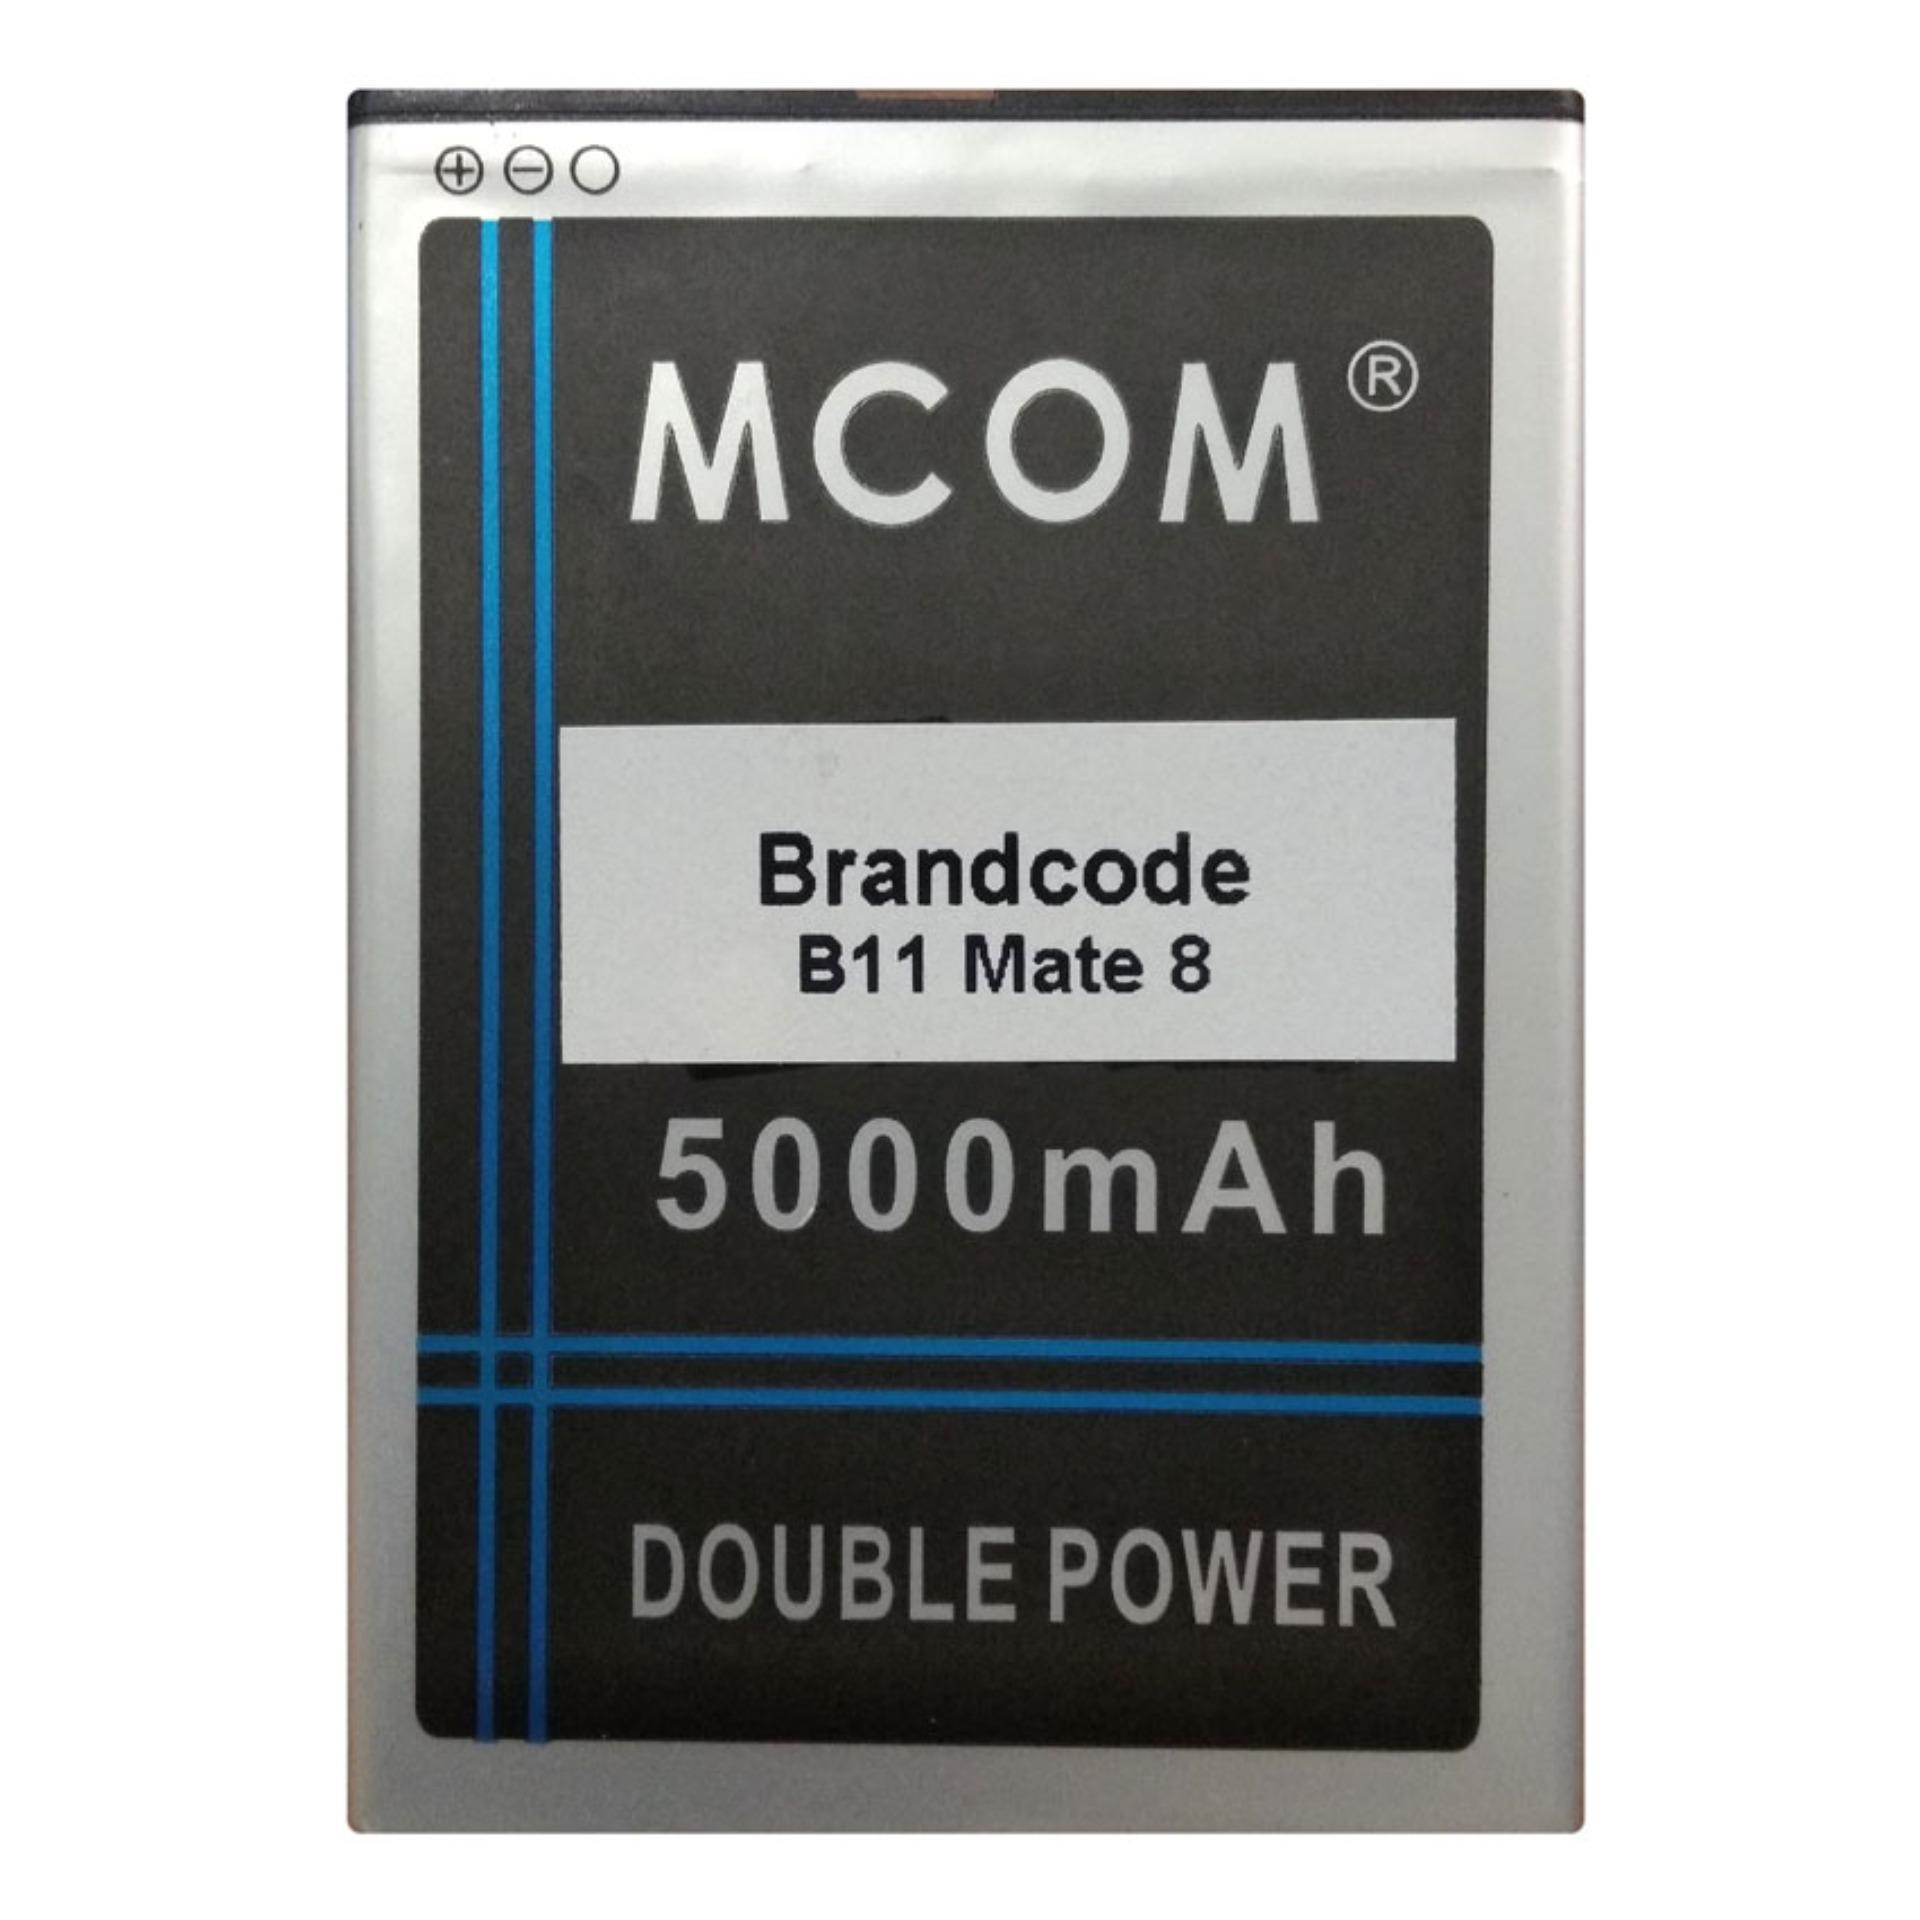 MCom Baterai Double Power Battery for Brandcode B11 Mate 8  - 5000 mAh